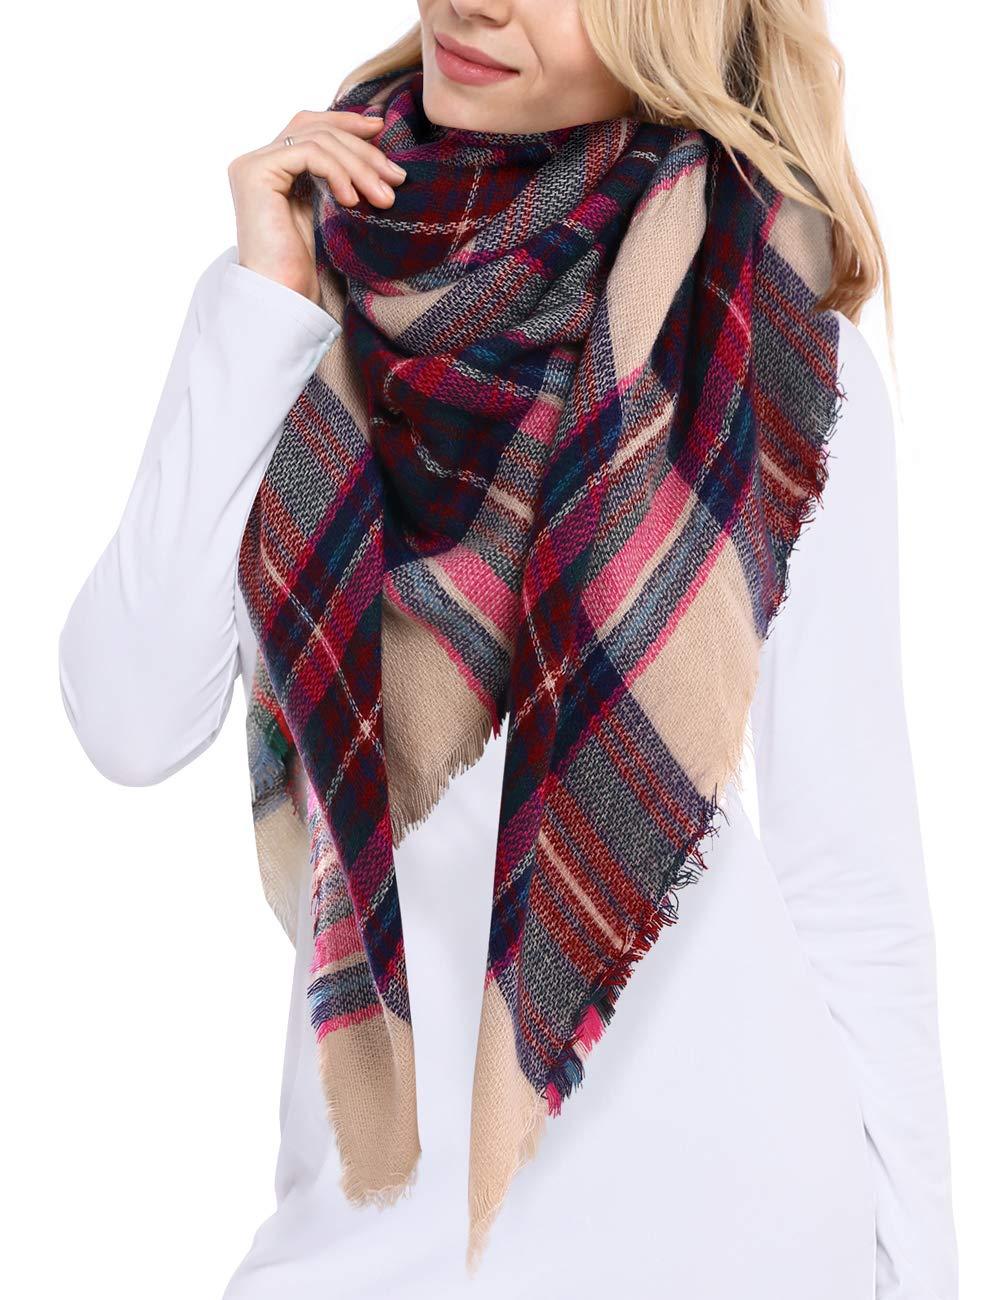 Bess Bridal Women's Plaid Blanket Winter Scarf Warm Cozy Tartan Wrap Oversized Shawl Cape by Bess Bridal